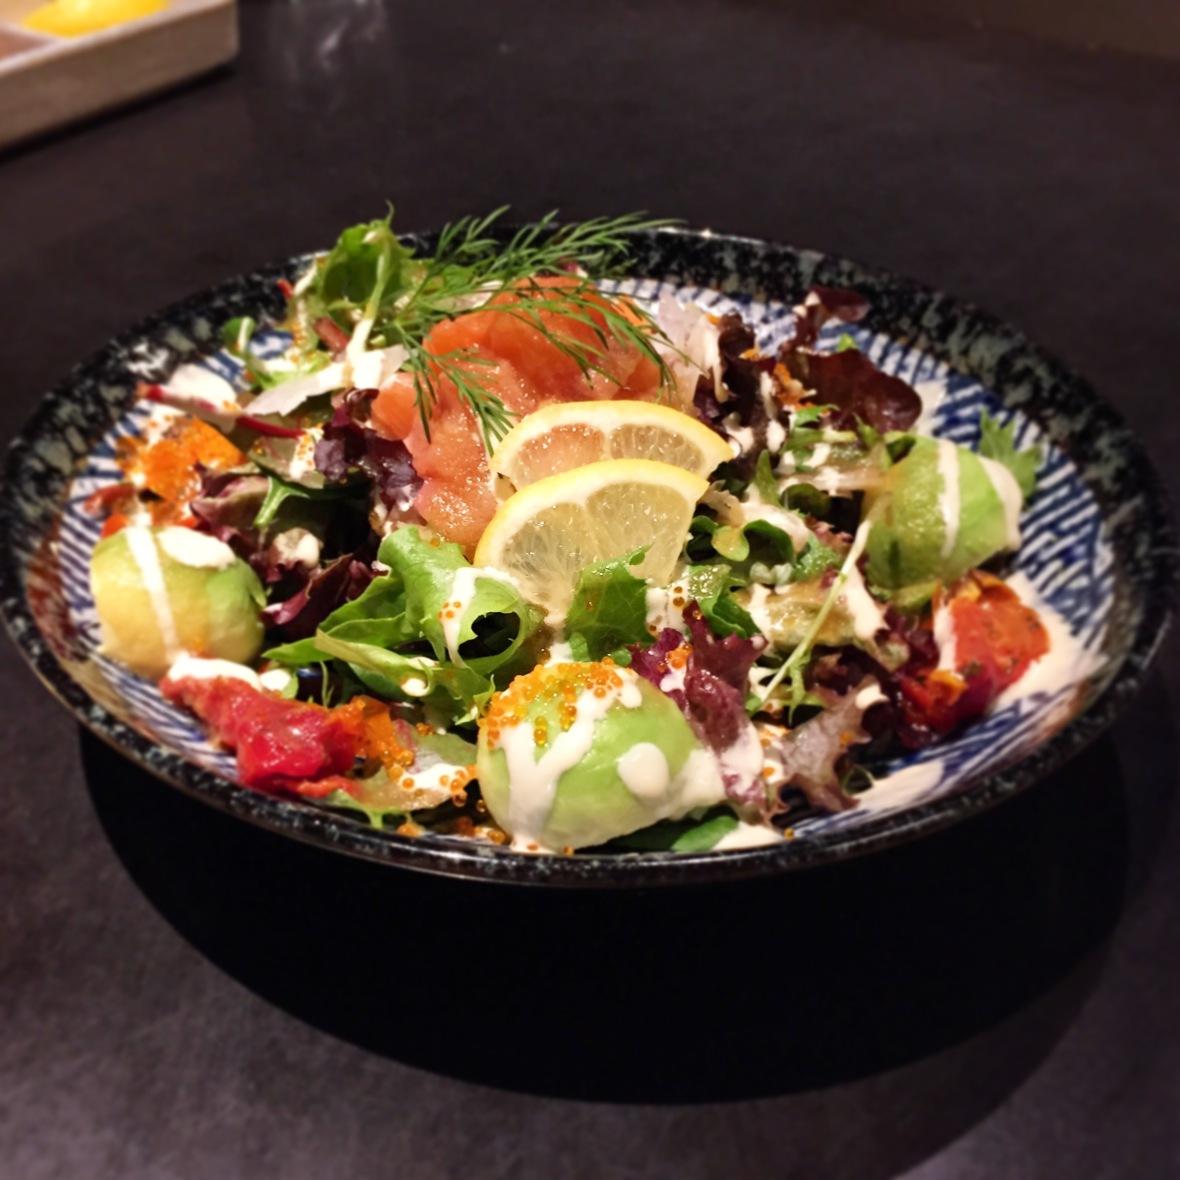 Rengaya Salmon and Avocado Salad